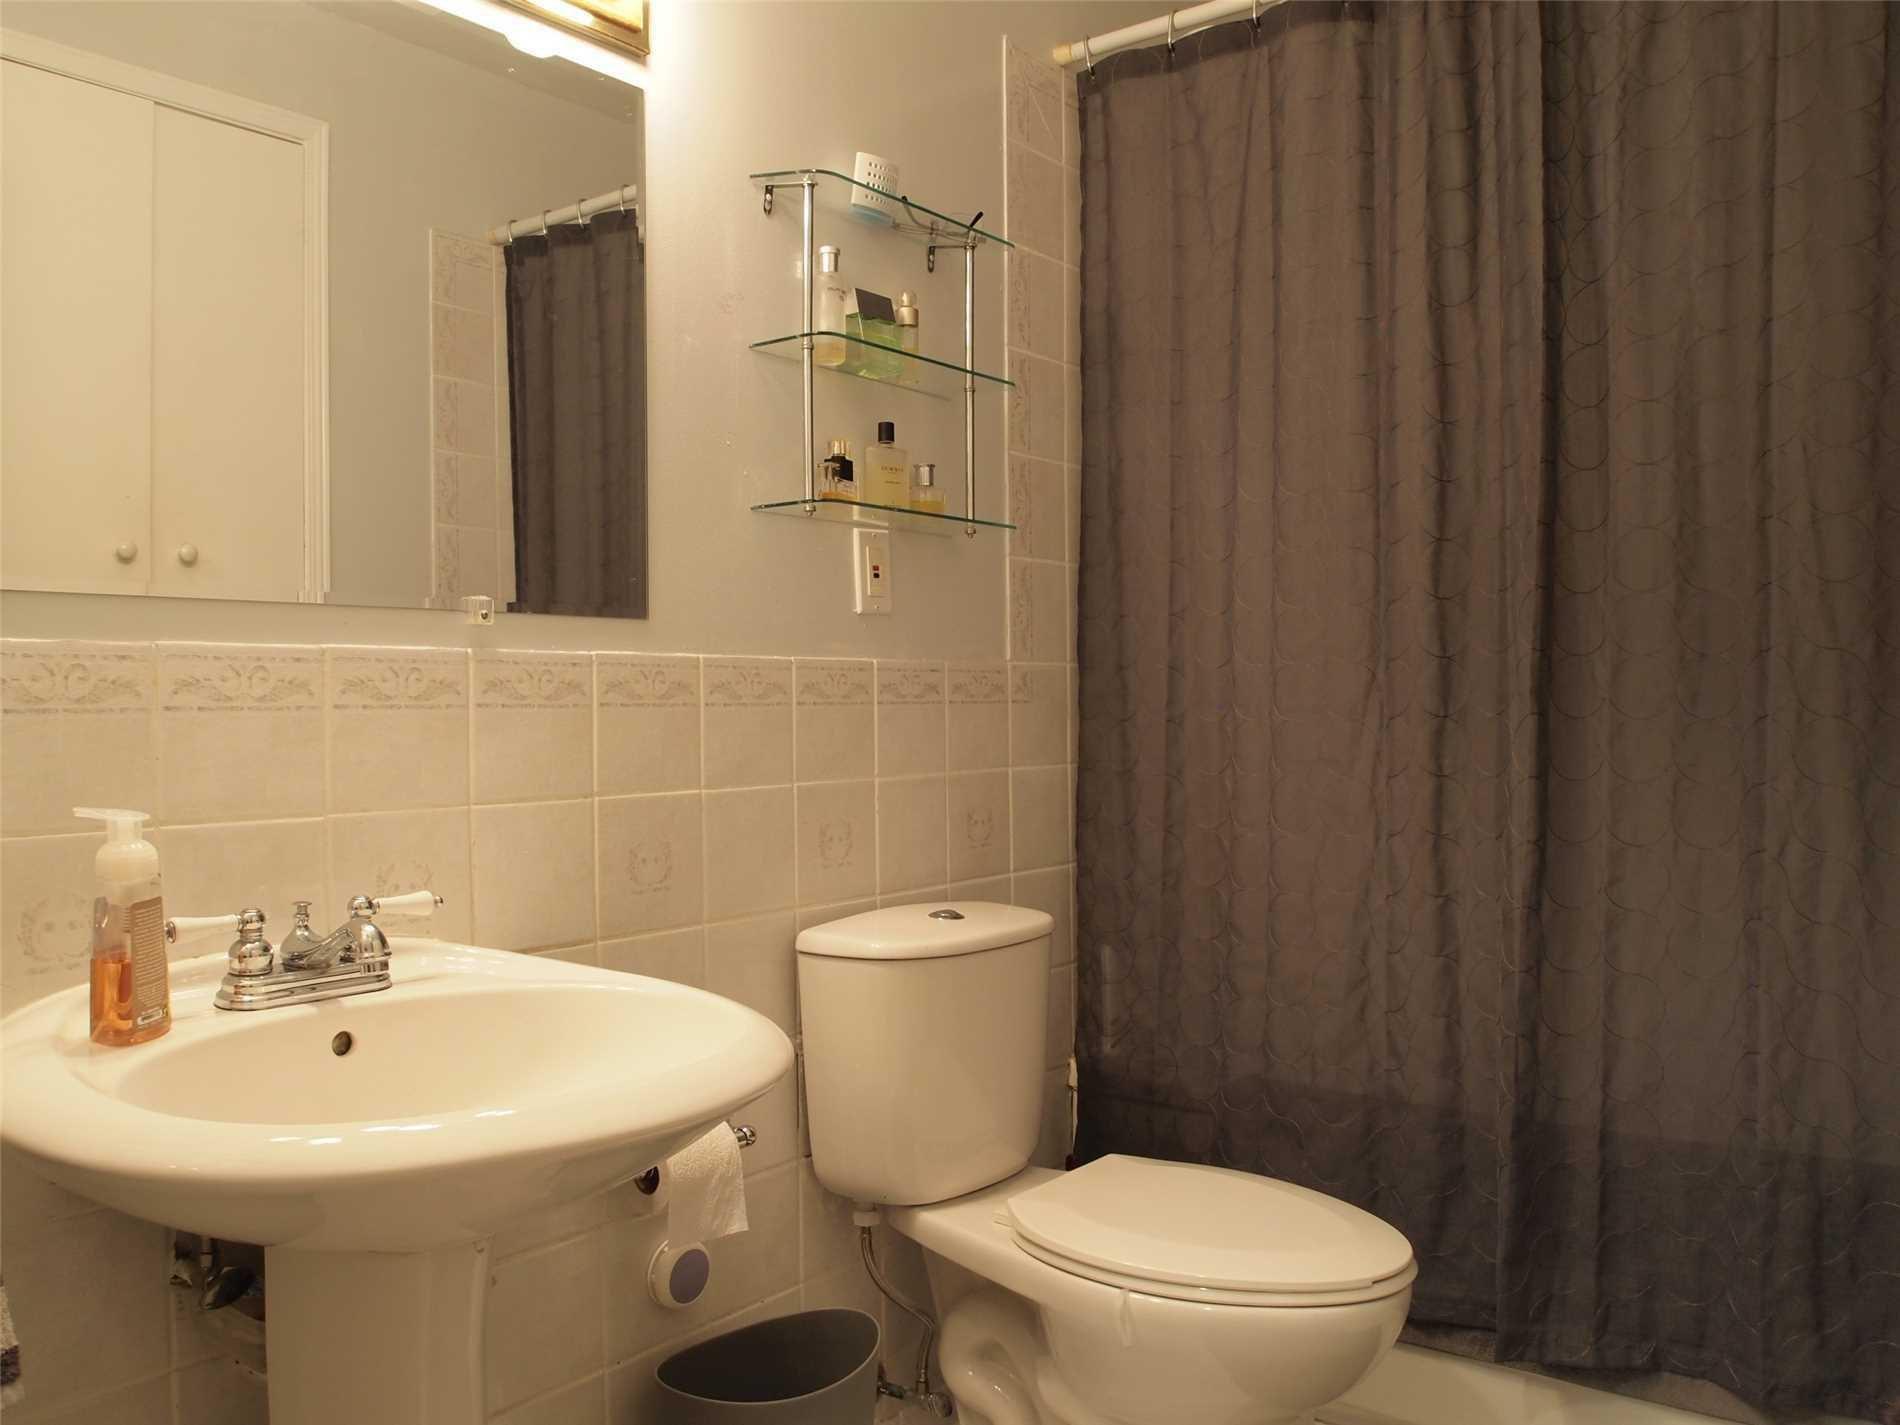 Photo 18: Photos: 105 Fifth Street in Brock: Beaverton House (Bungalow) for sale : MLS®# N4564596